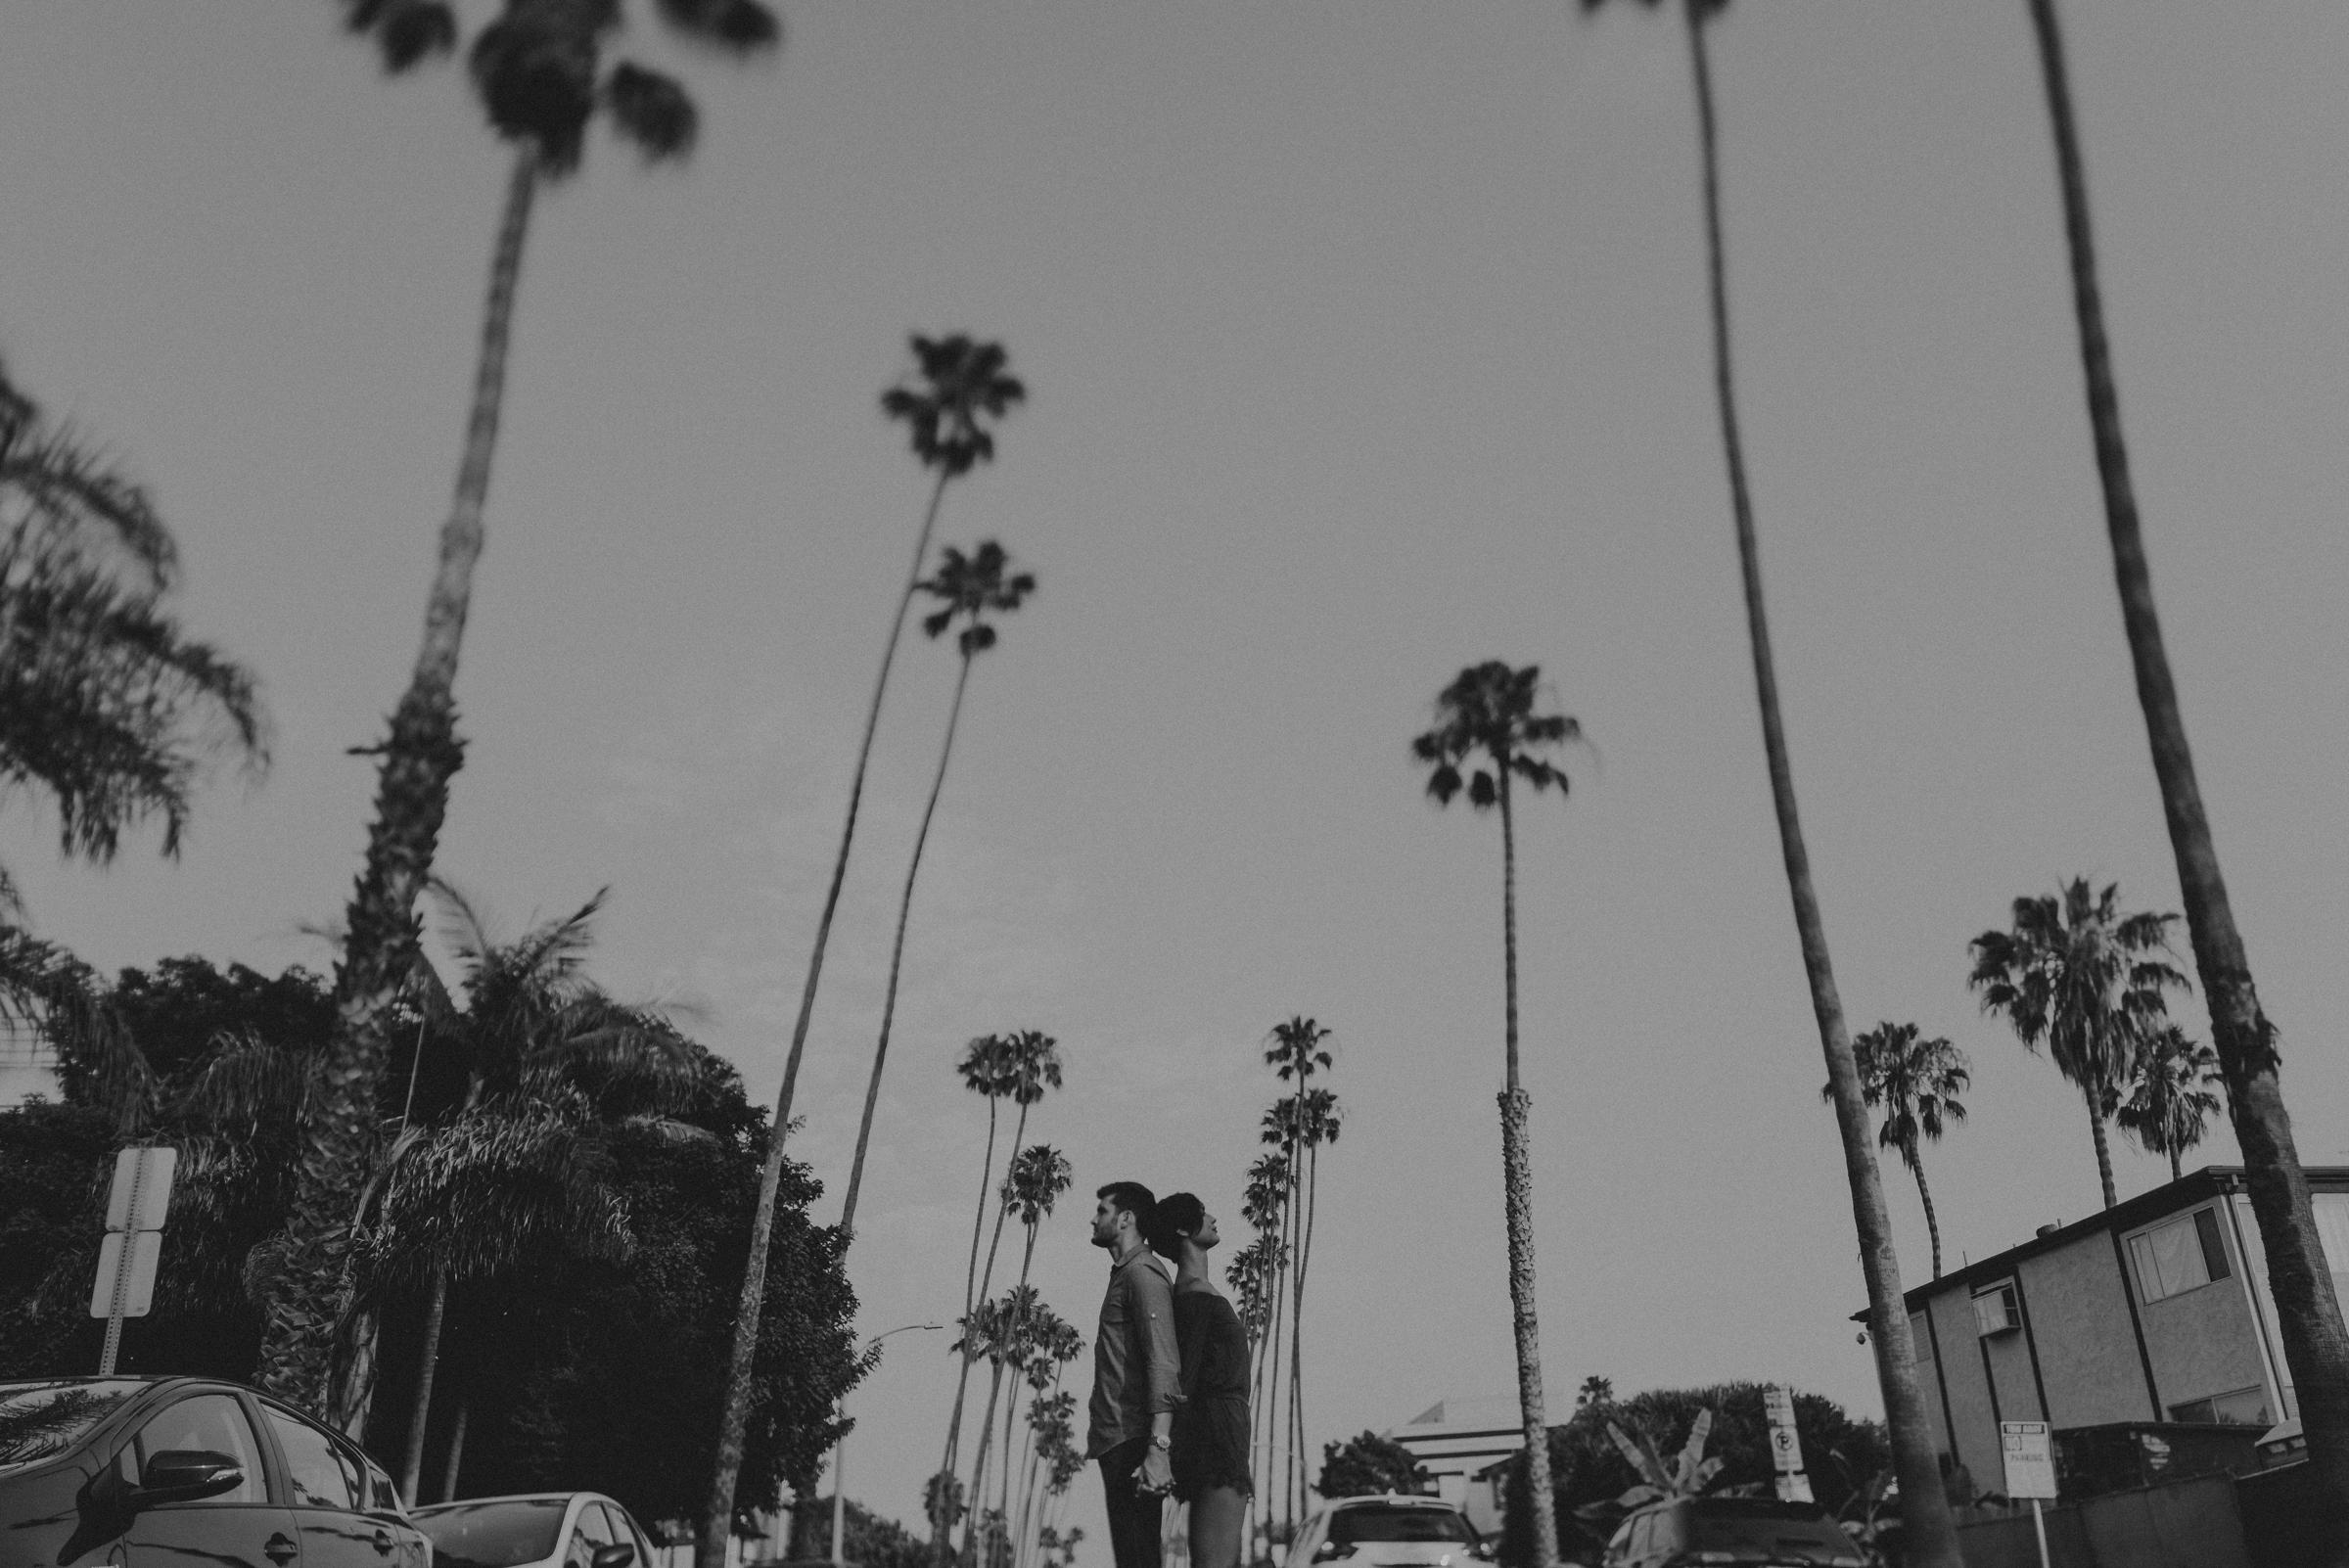 Isaiah + Taylor Photography - Santa Monica Engagement Session, Los Angeles Wedding Photographer-008.jpg